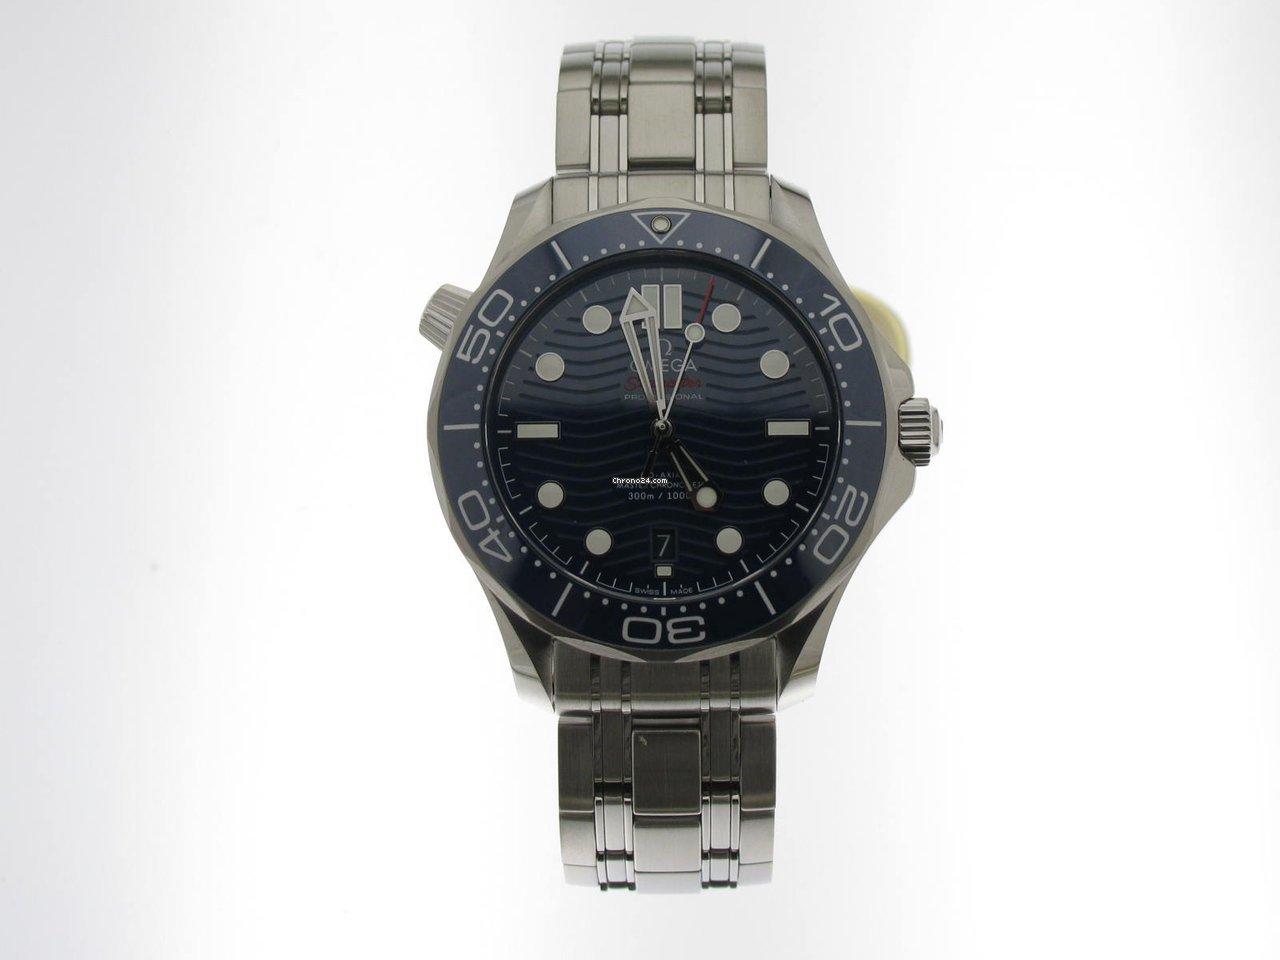 Omega Seamaster Diver 300 M 210.30.42.20.03.001 2021 new